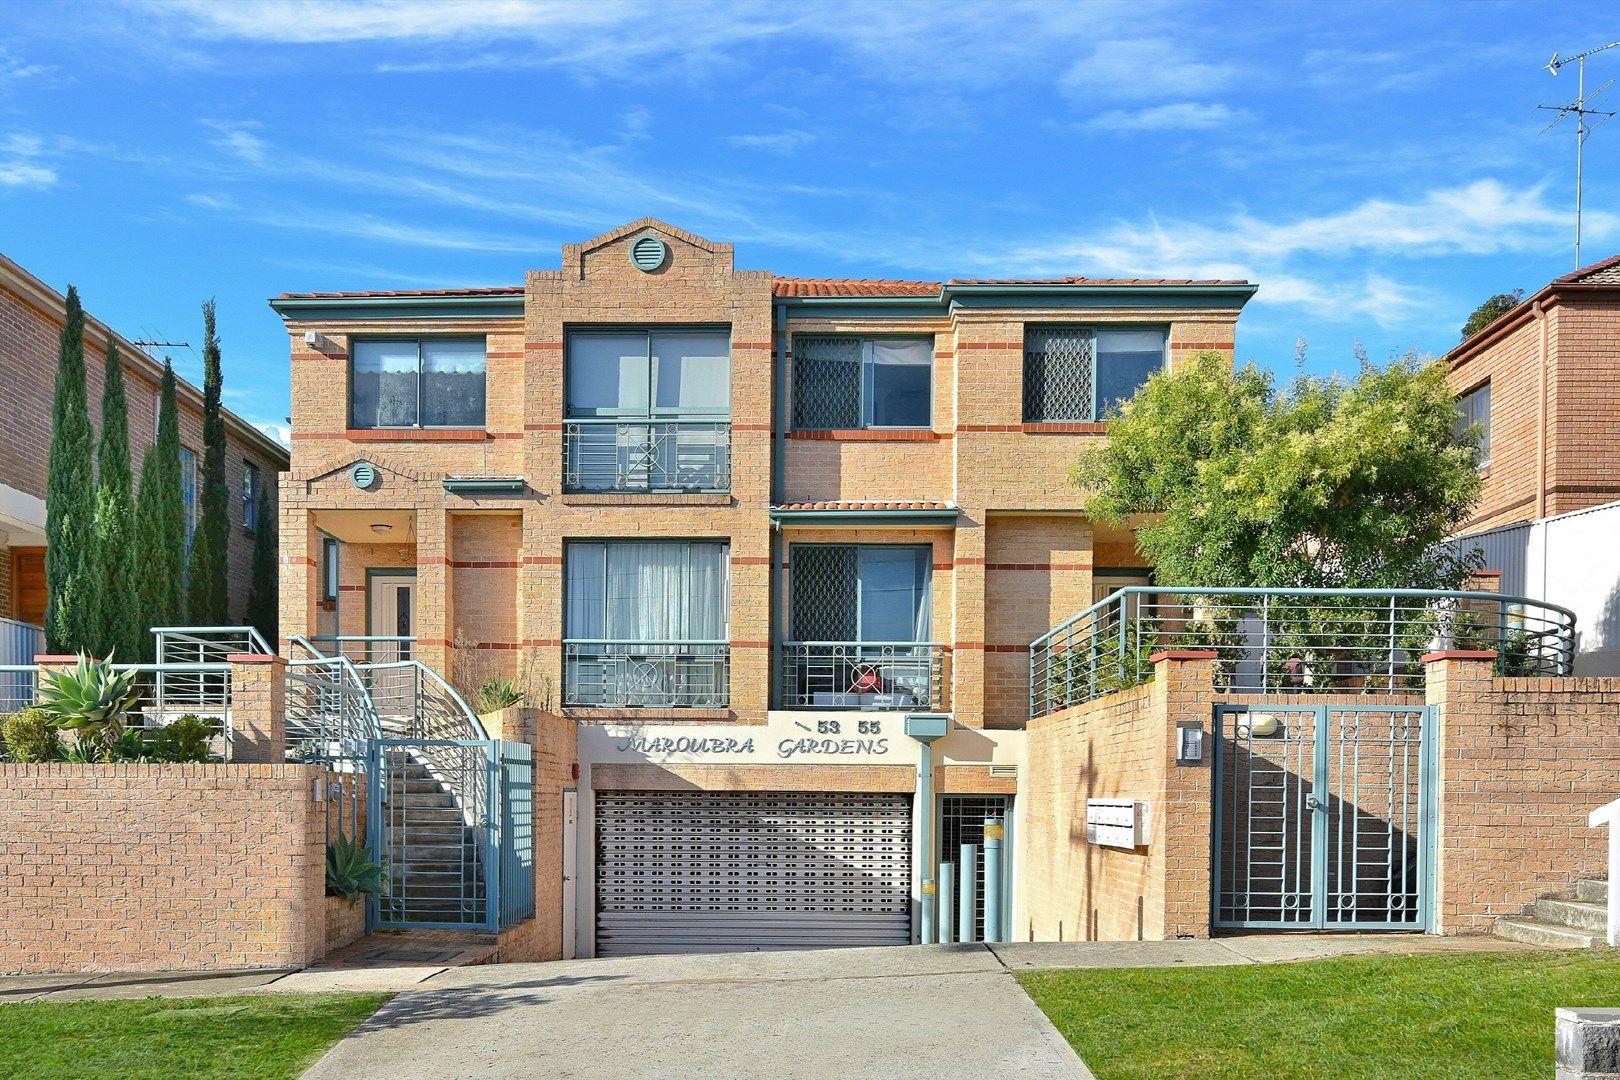 5/53-55 Robey Street, Maroubra NSW 2035, Image 0